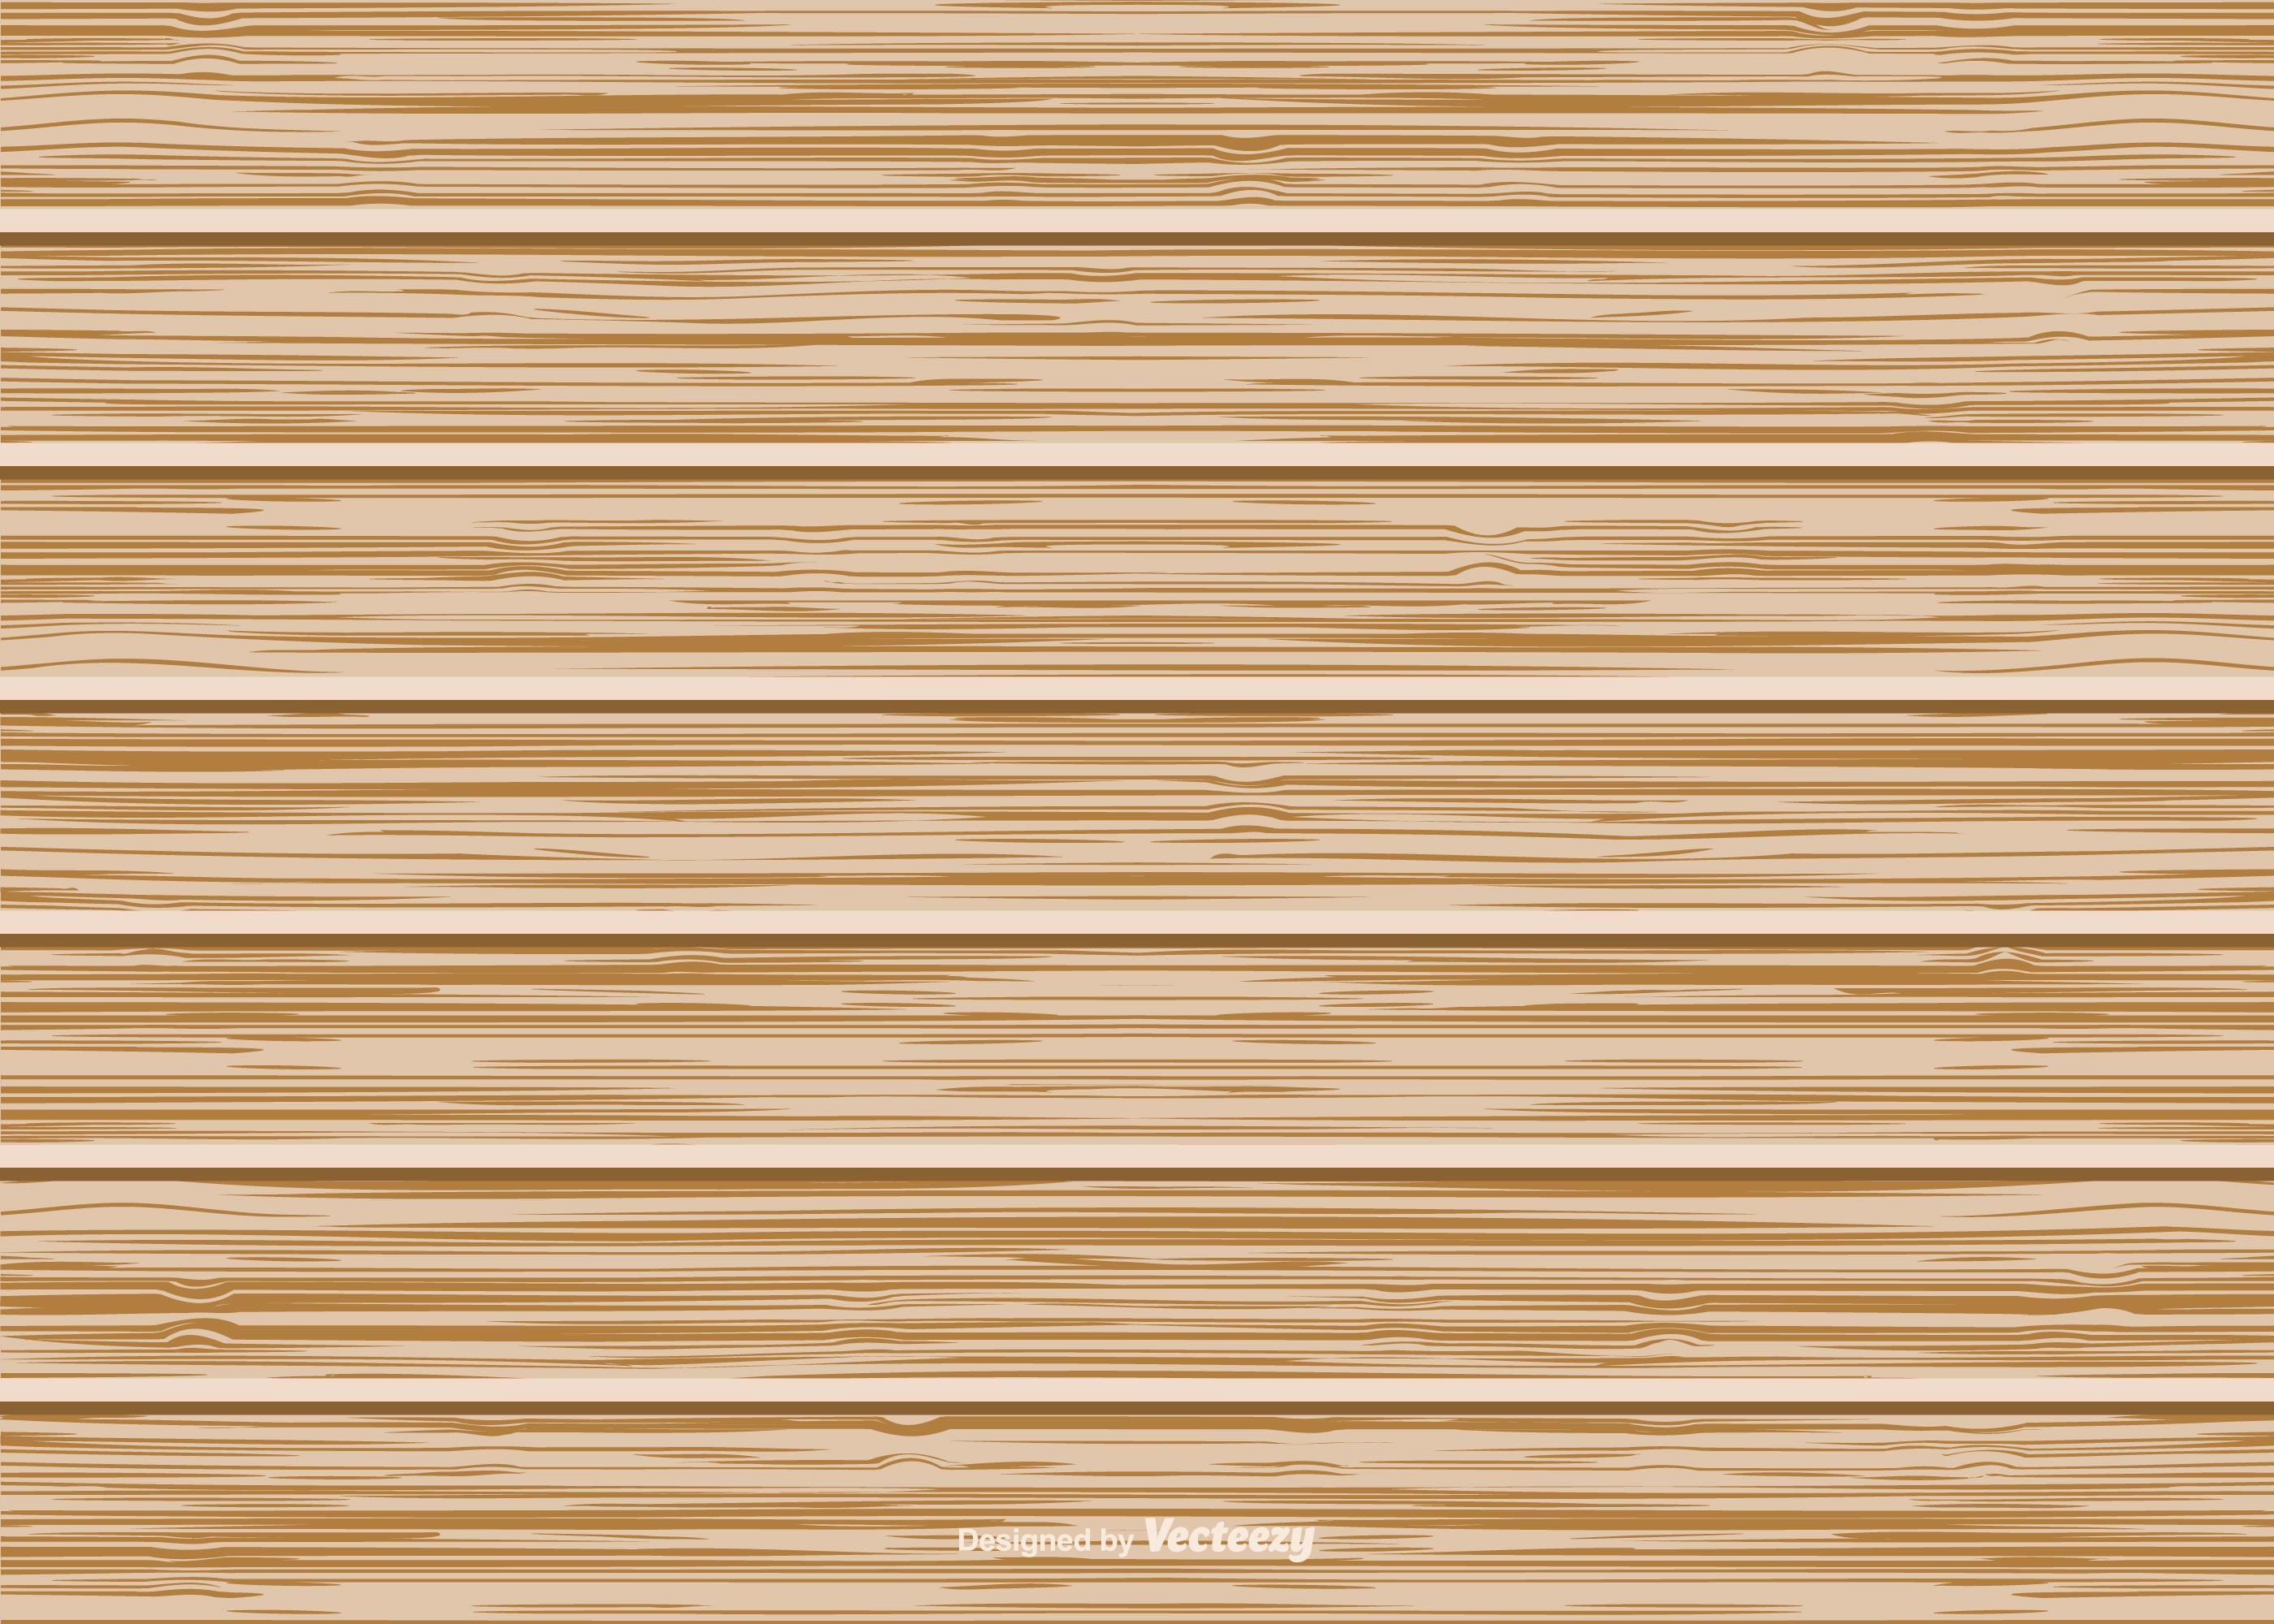 2800x2000 Wood Grain Texture Free Vector Art